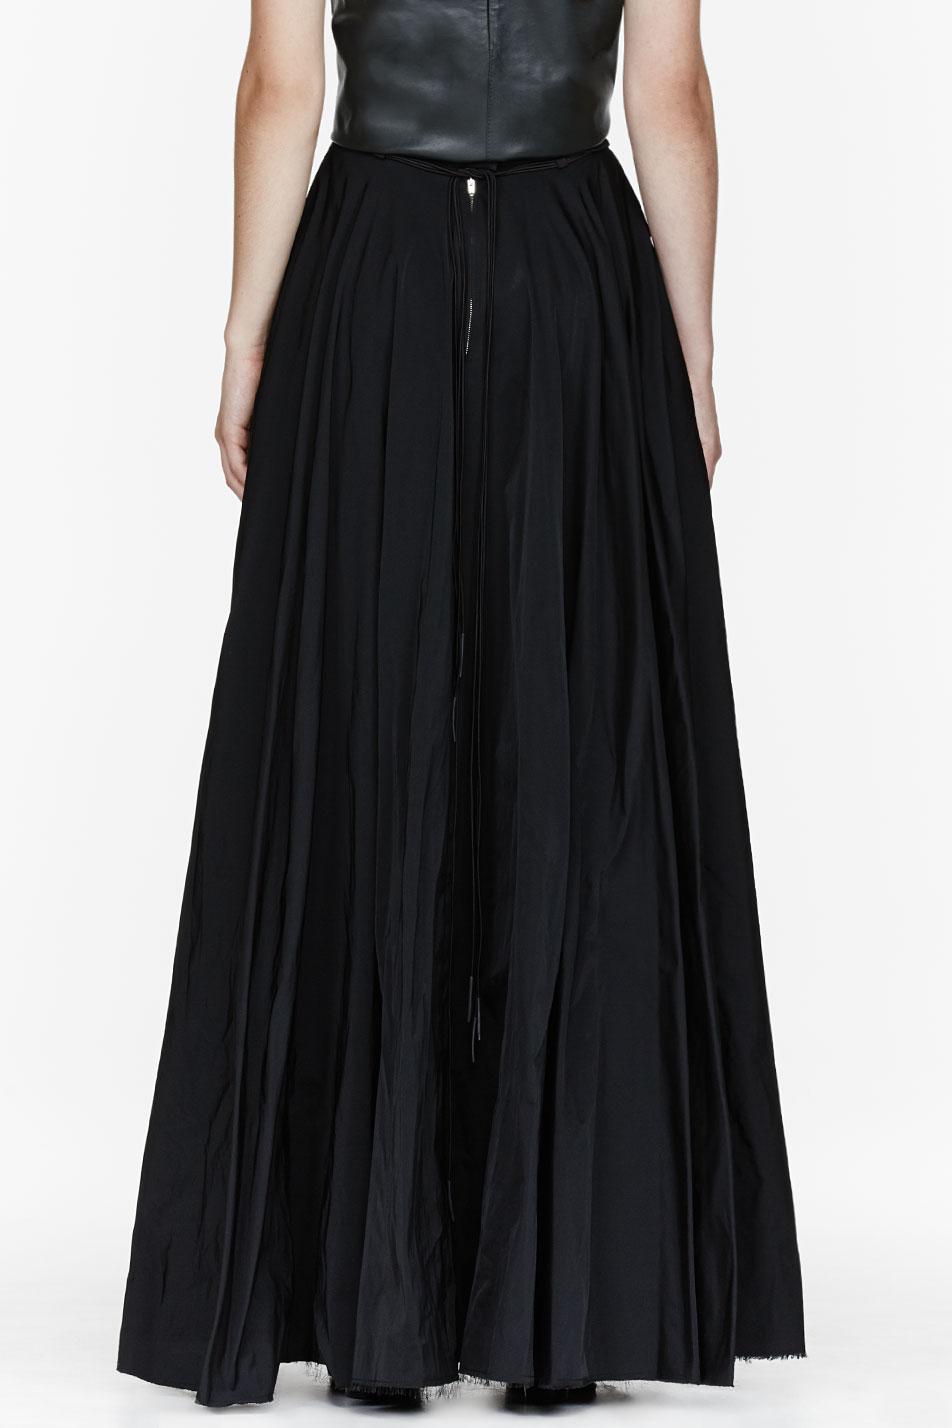 Yang Li Black Floor Length Circle Skirt In Lyst